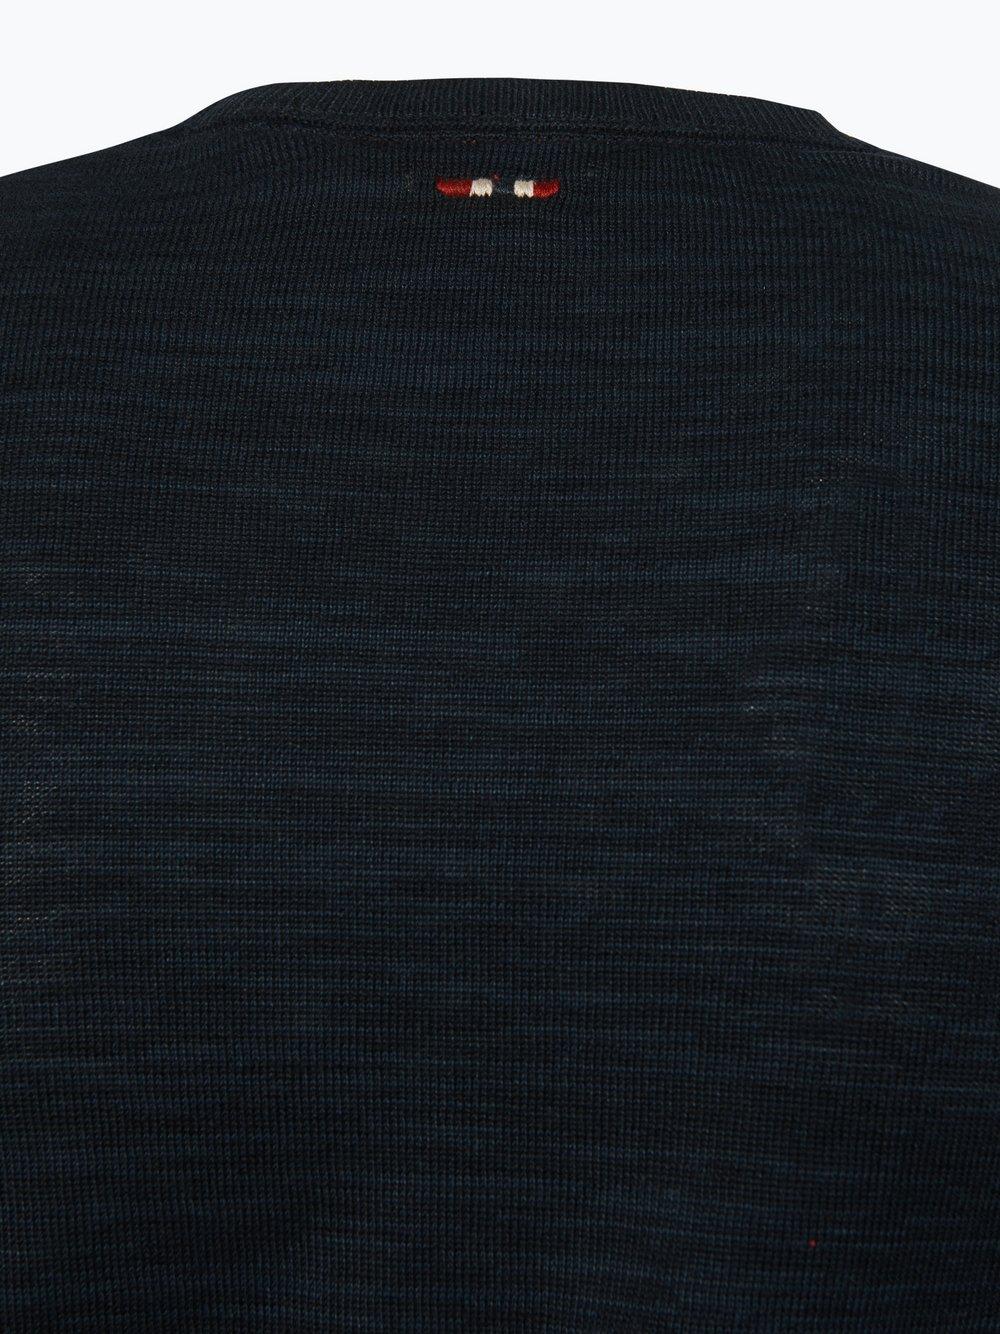 Napapijri Herren Pullover Dalice online kaufen   PEEK UND